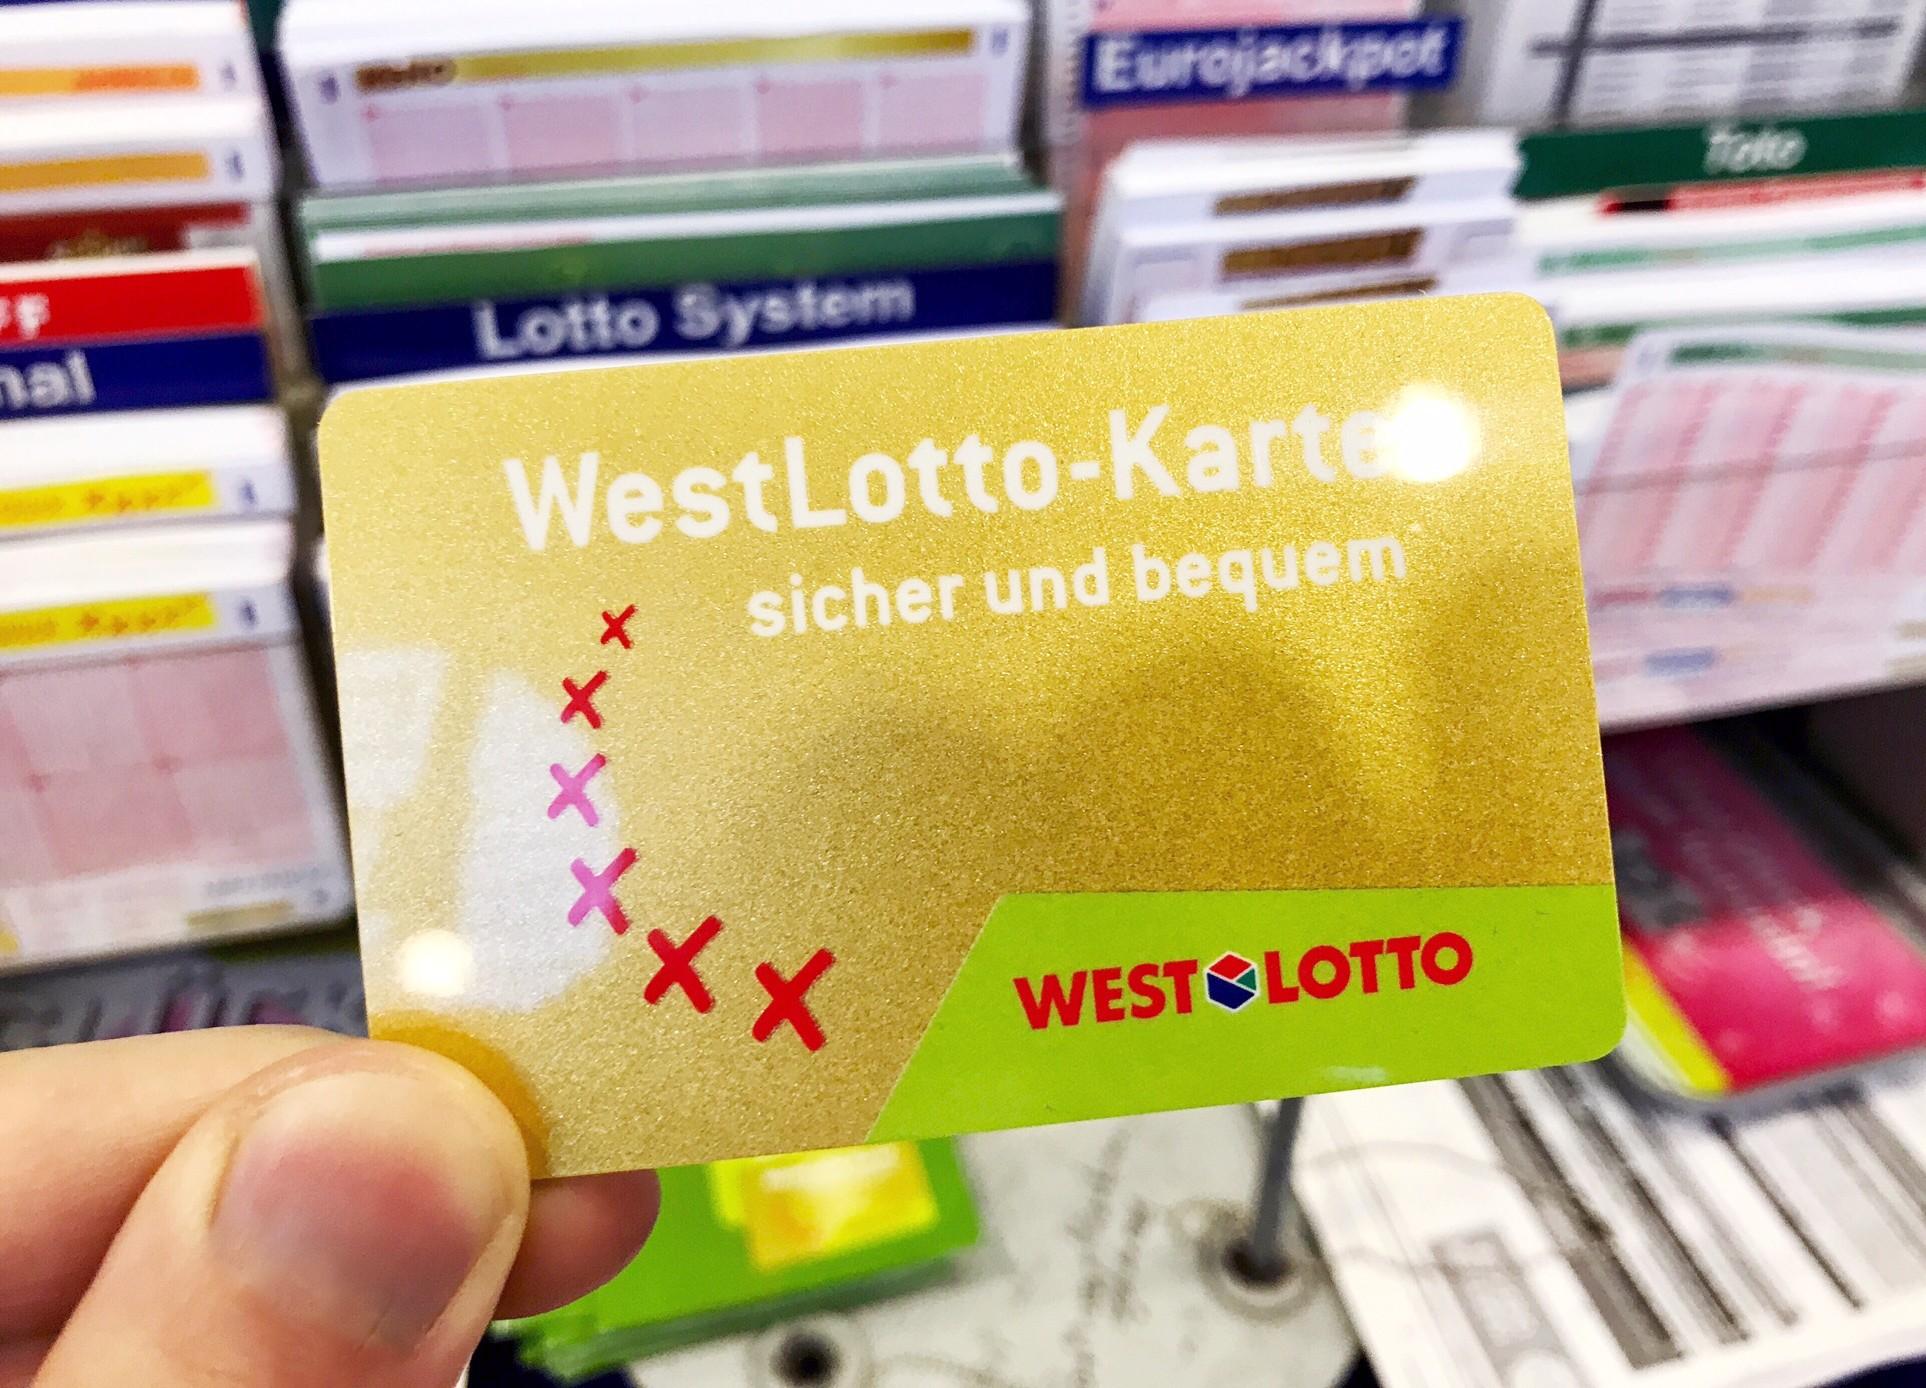 Site westlotto.de - online seo checker free analysis and westlotto.de website seo audit | portal whois.uanic.name